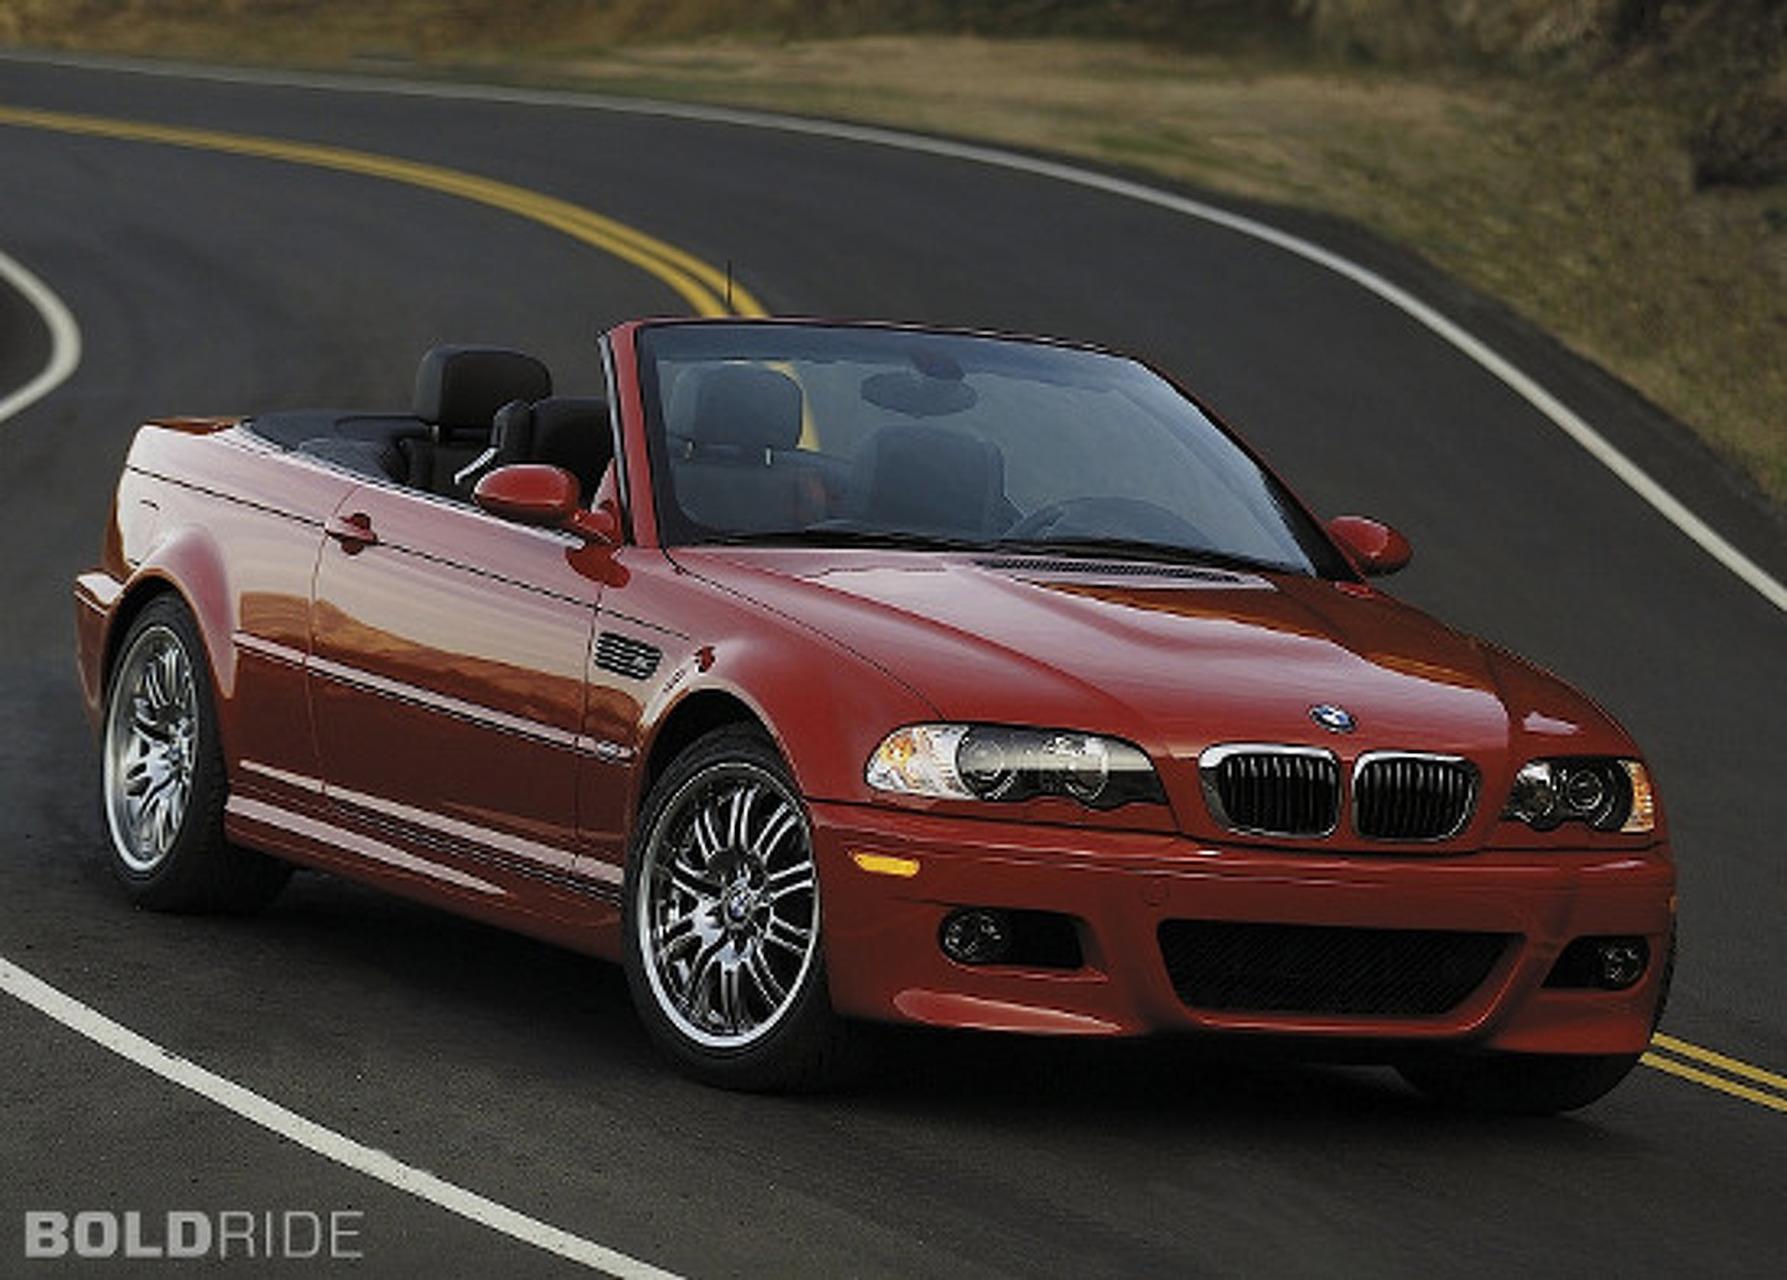 Why Your Car Brand Sucks/Rocks: BMW